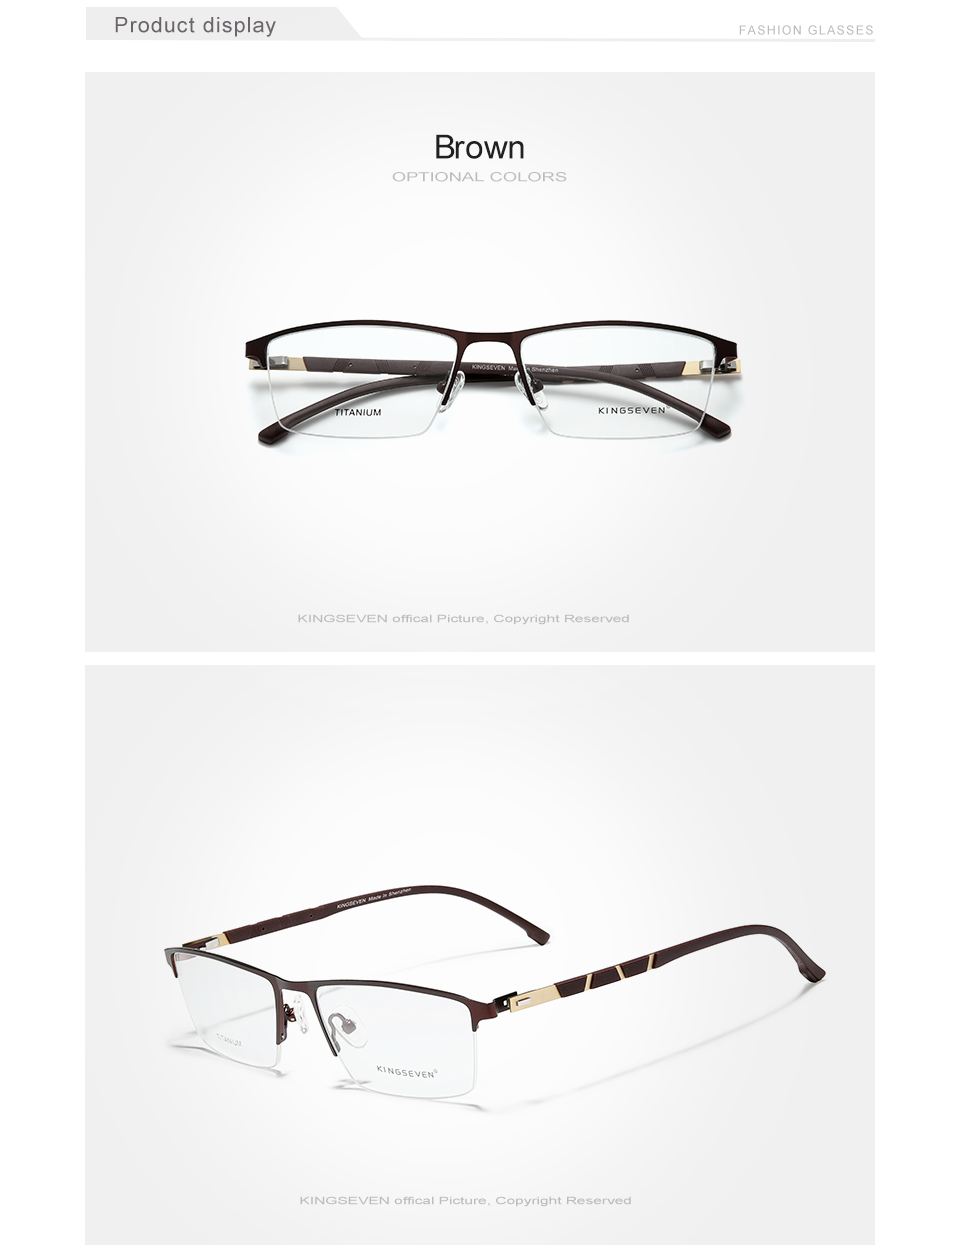 KINGSEVEN Titanium Glasses Frame Women Vintage Round Myopia Optical Prescription Eyeglass Frame Men 2020 New Oval Eyewear